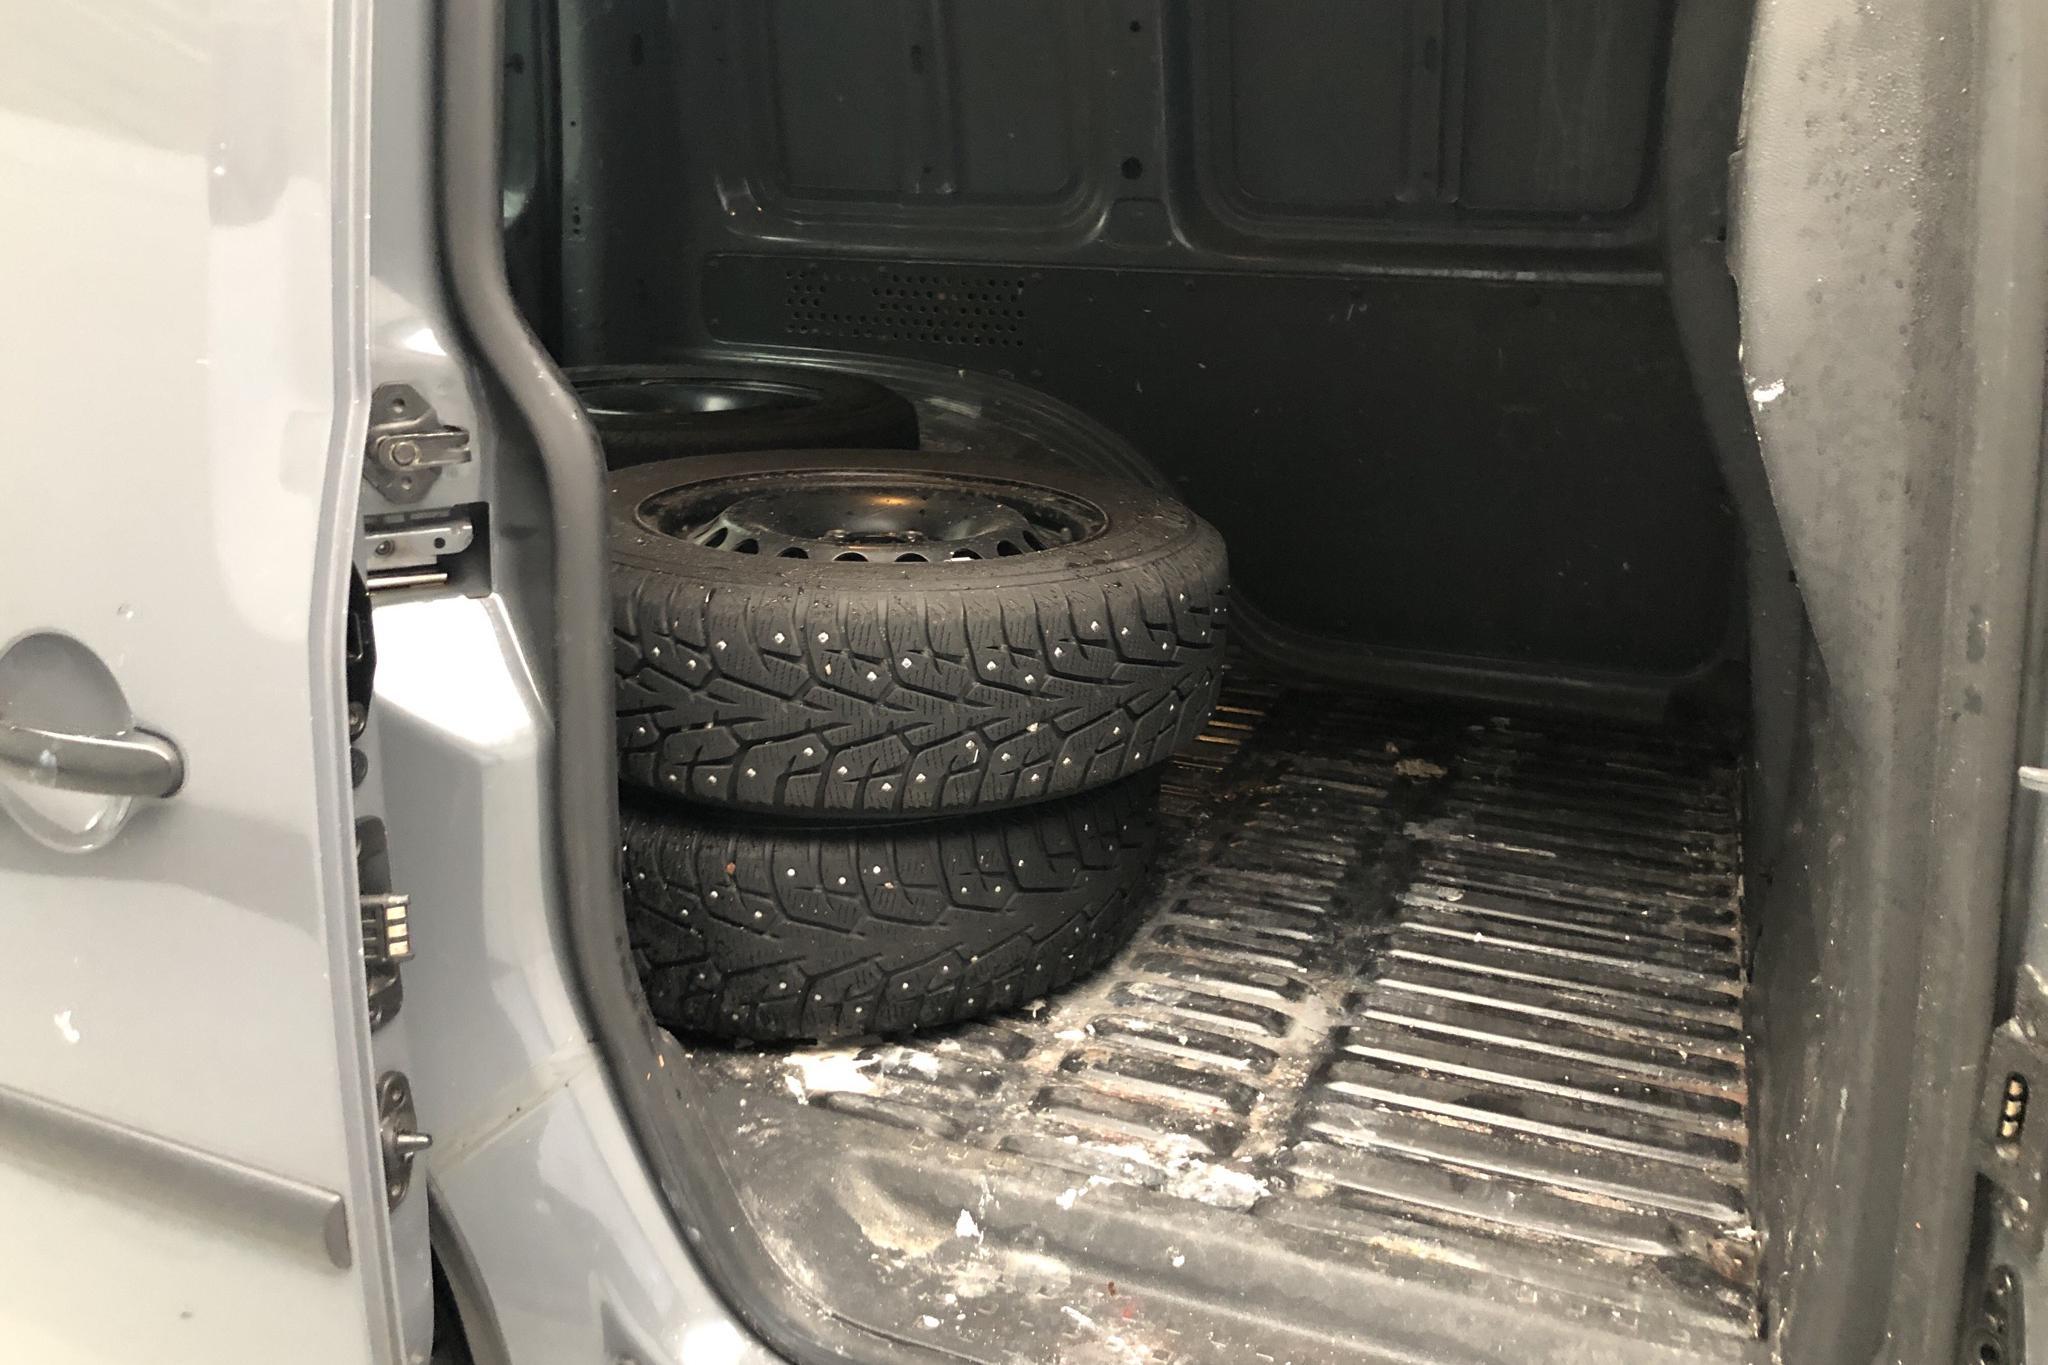 VW Caddy 1.6 TDI Skåp (102hk) - 15 918 mil - Manuell - Light Grey - 2011